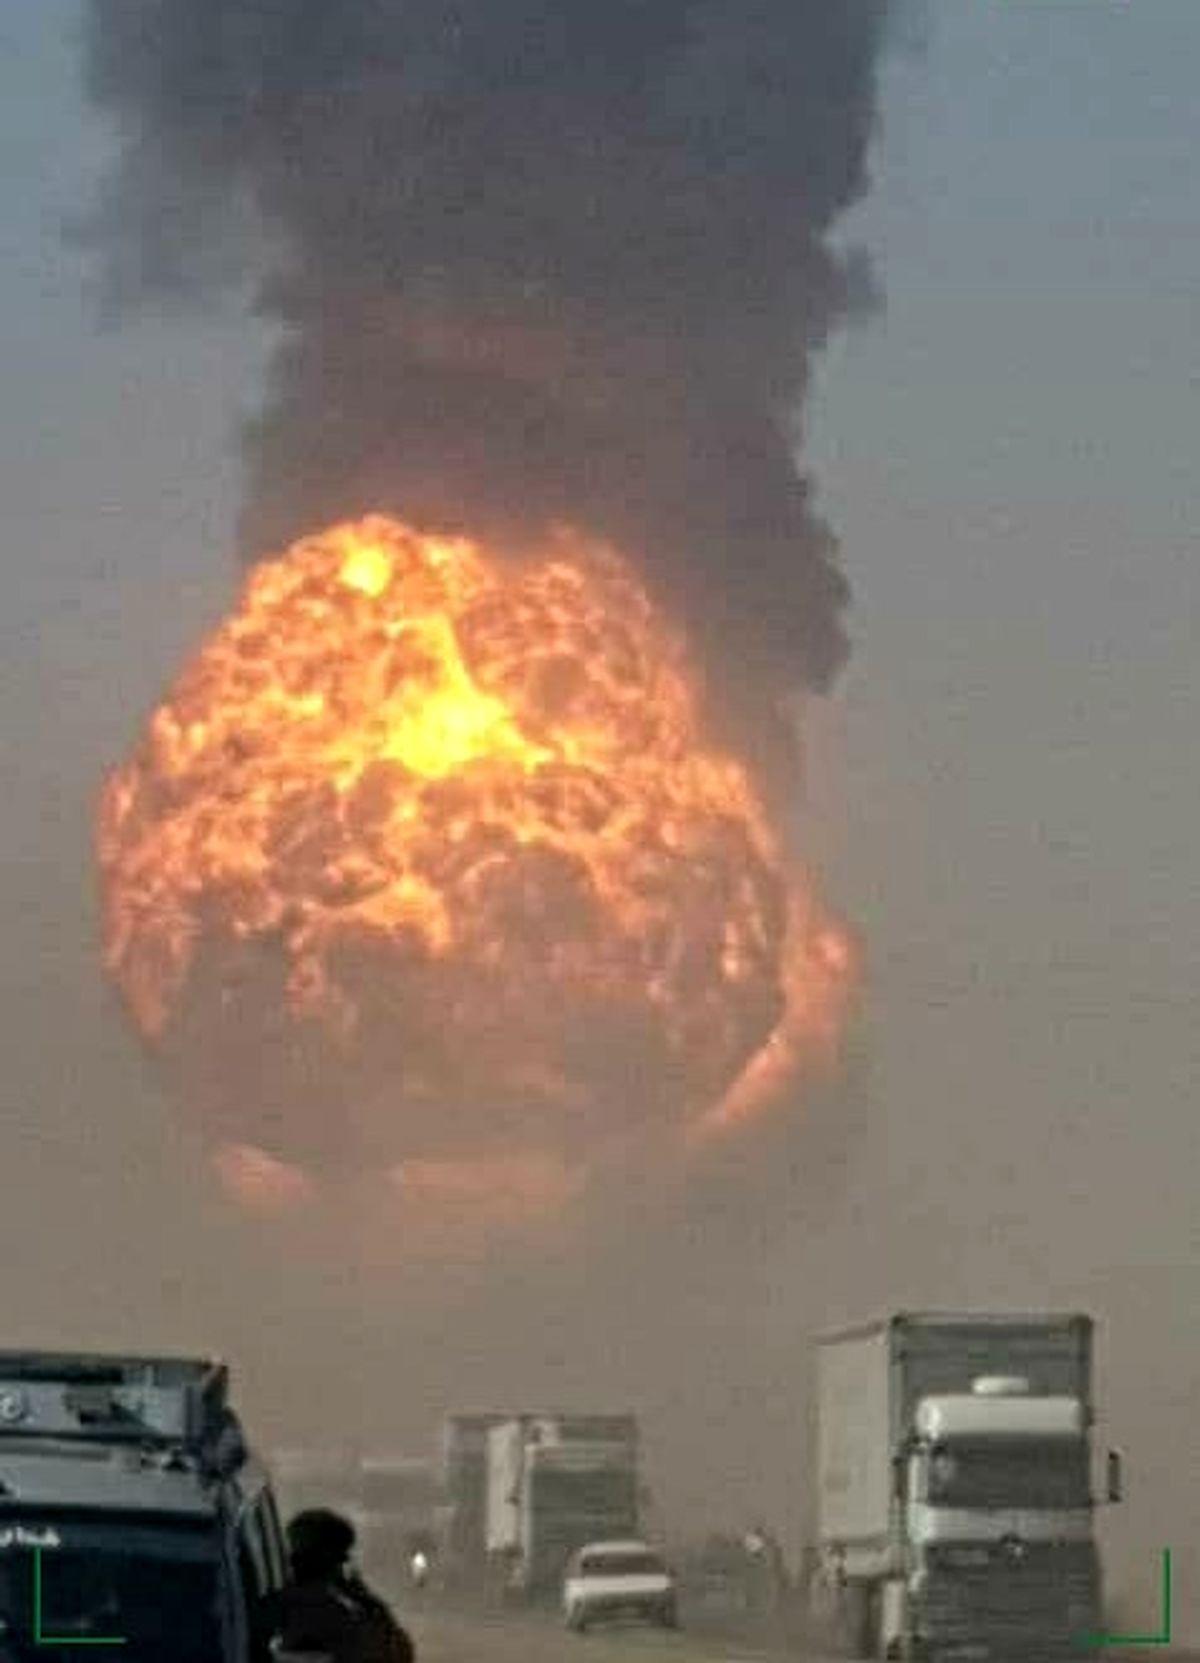 فوری/ لحظه وحشتناک انفجار گمرک اسلام قلعه +فیلم